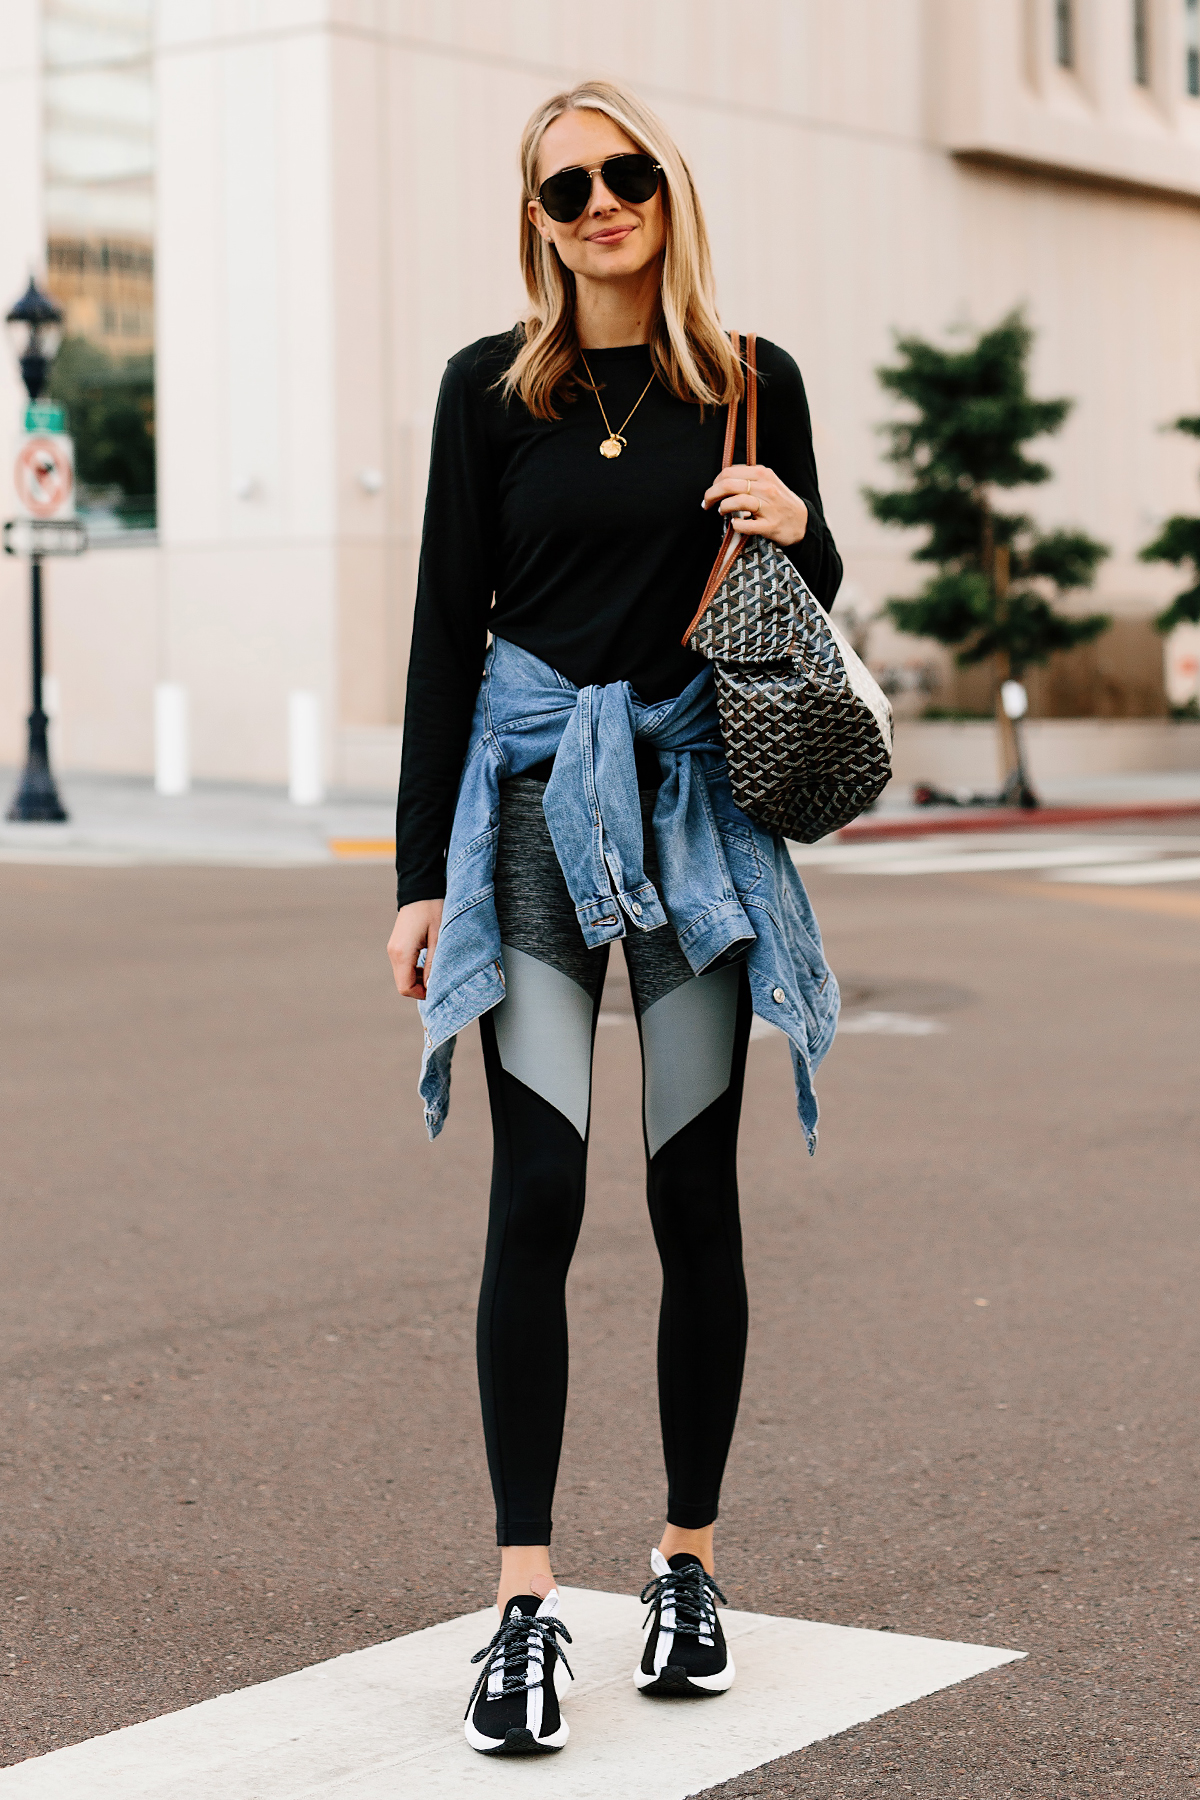 Blonde Woman Wearing Black Long Sleeve Top Denim Jacket Reebok Colorblock Leggings Reebok Sole Fury Black Sneakers Goyard Tote Fashion Jackson San Diego Fashion Blogger Street Style Athleisure Outfit